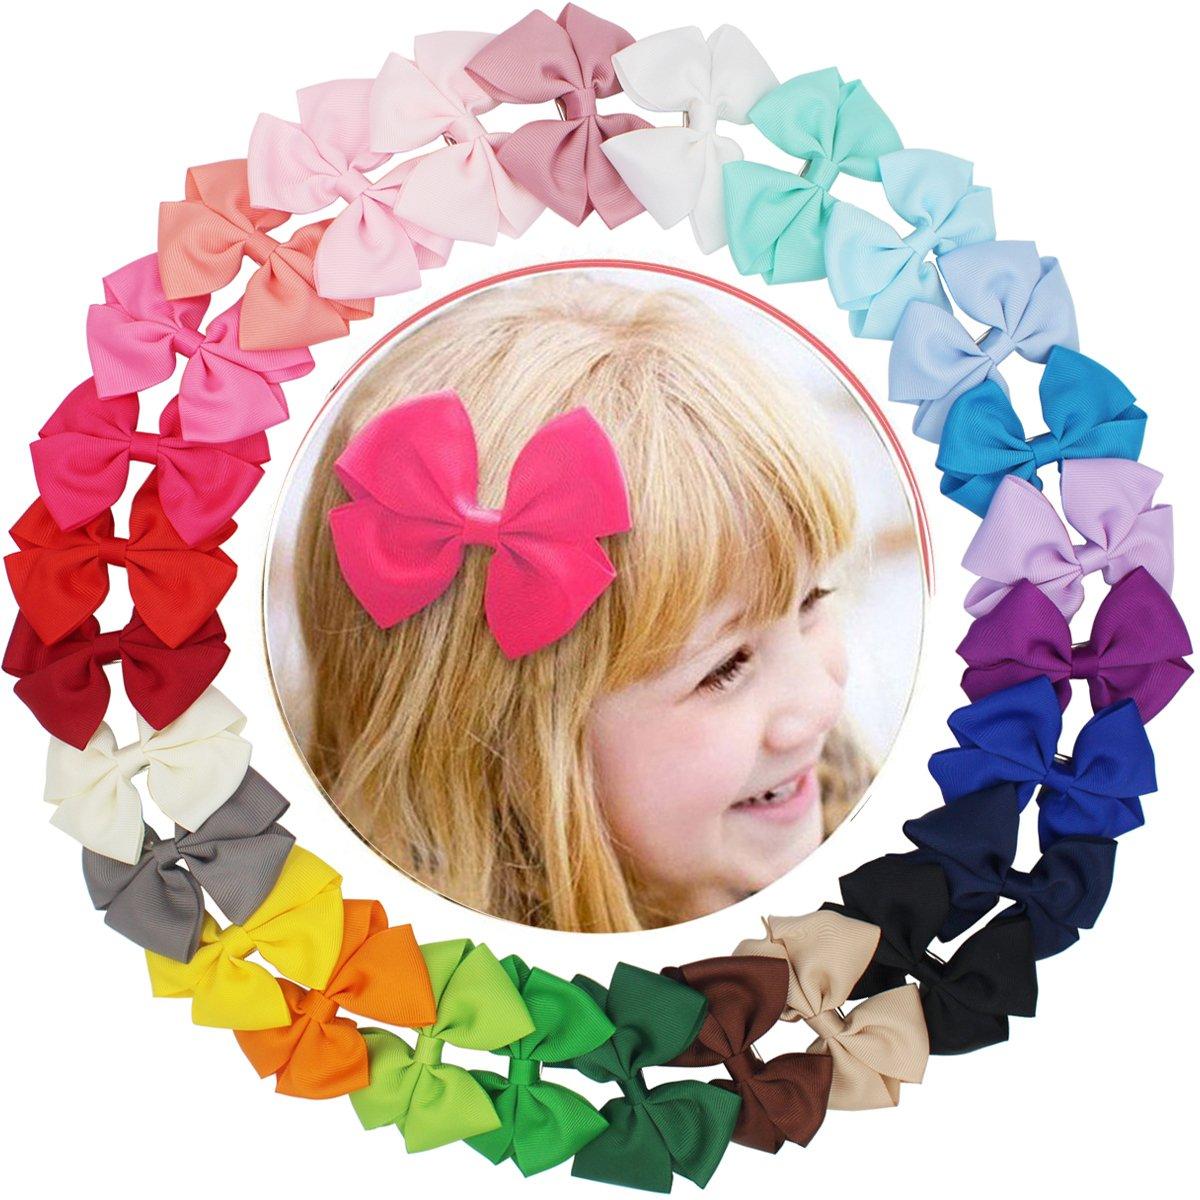 27 lazos de grogrén para niñas y bebés, accesorios para el pelo con pinzas antideslizantes MyLot